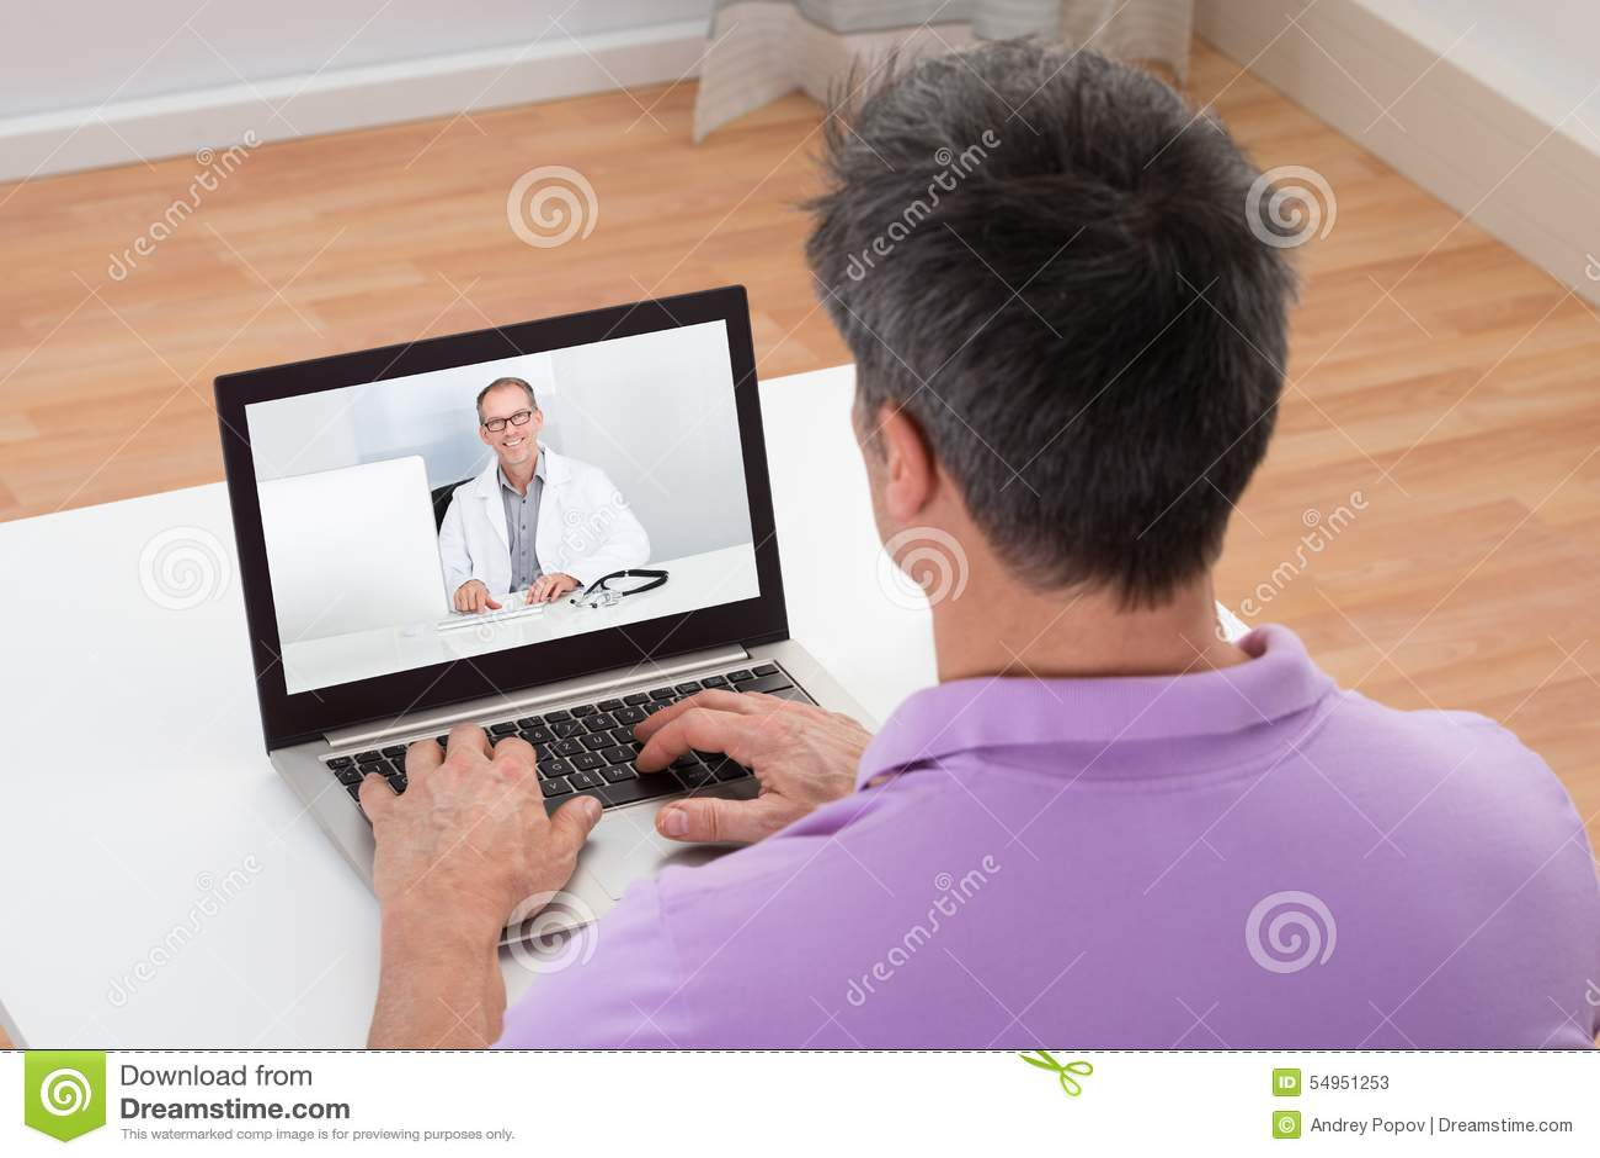 man video chat